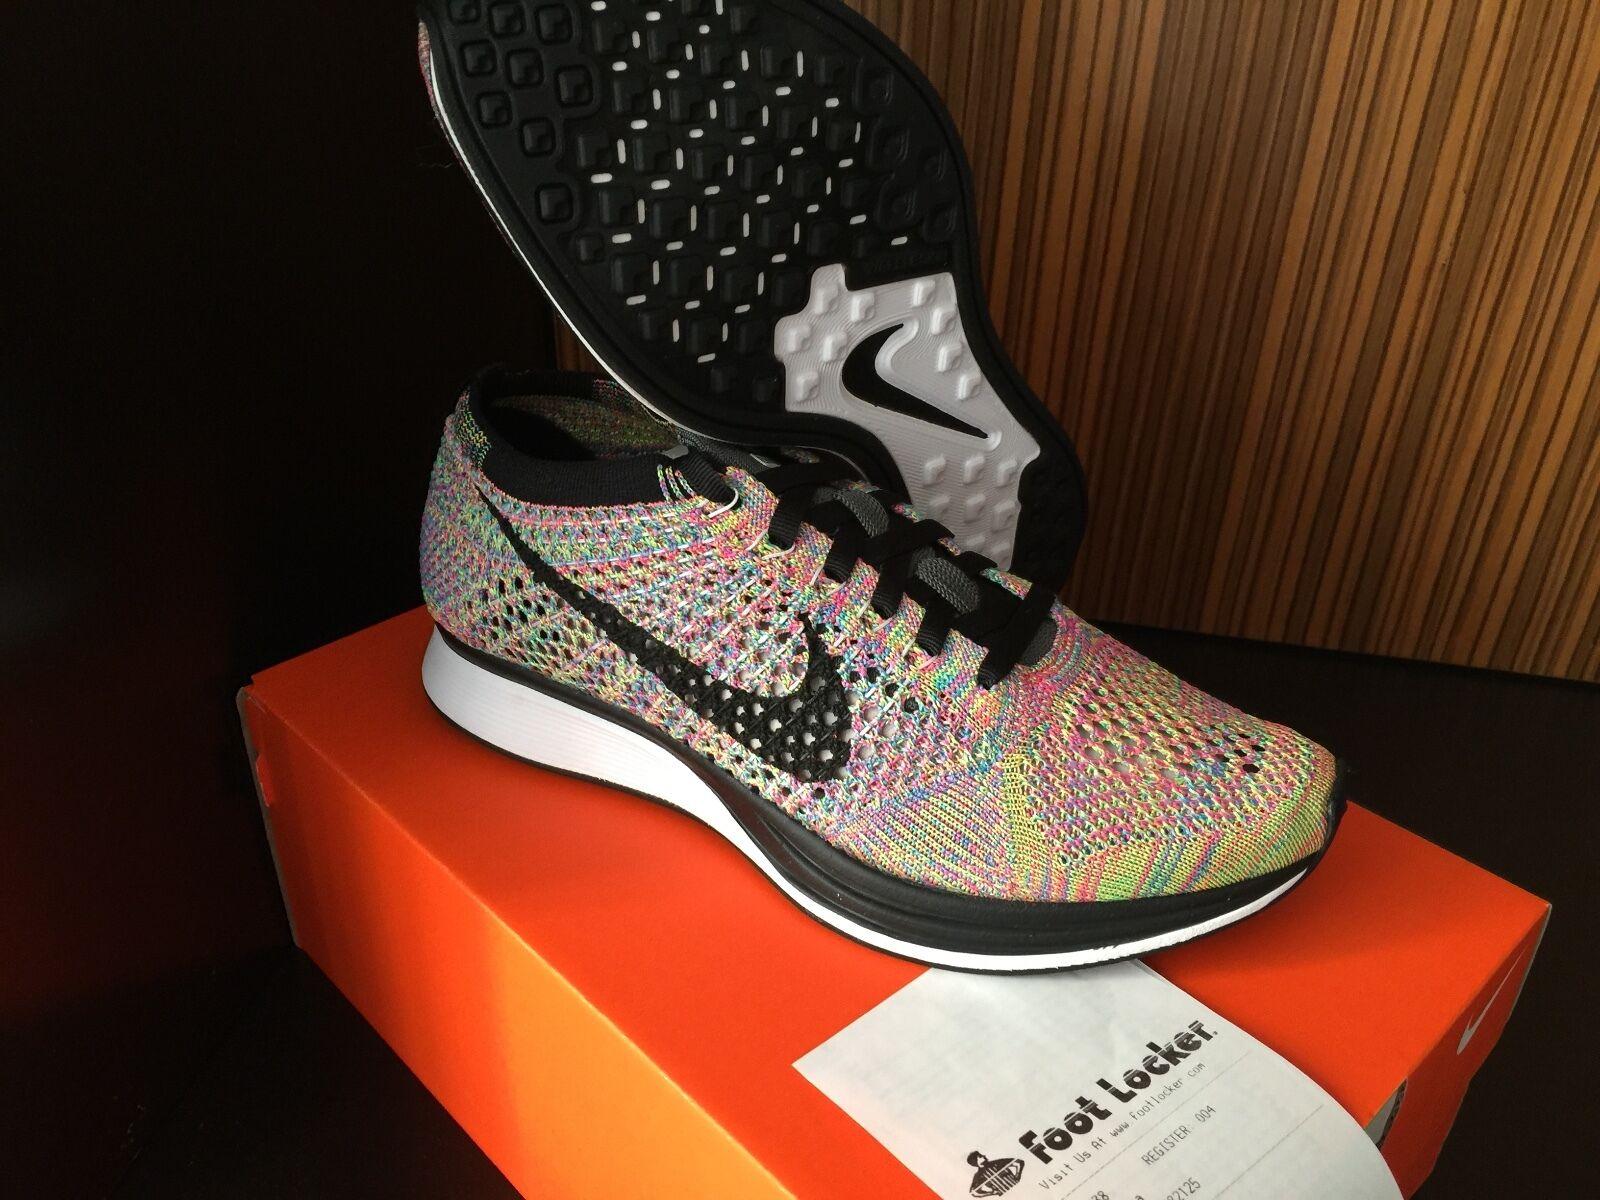 Nike air 95 max 90 flyknit racer regenbogen yeezy 95 air 1 pegasus 83 / 30 rennen 3m keks 1018c5